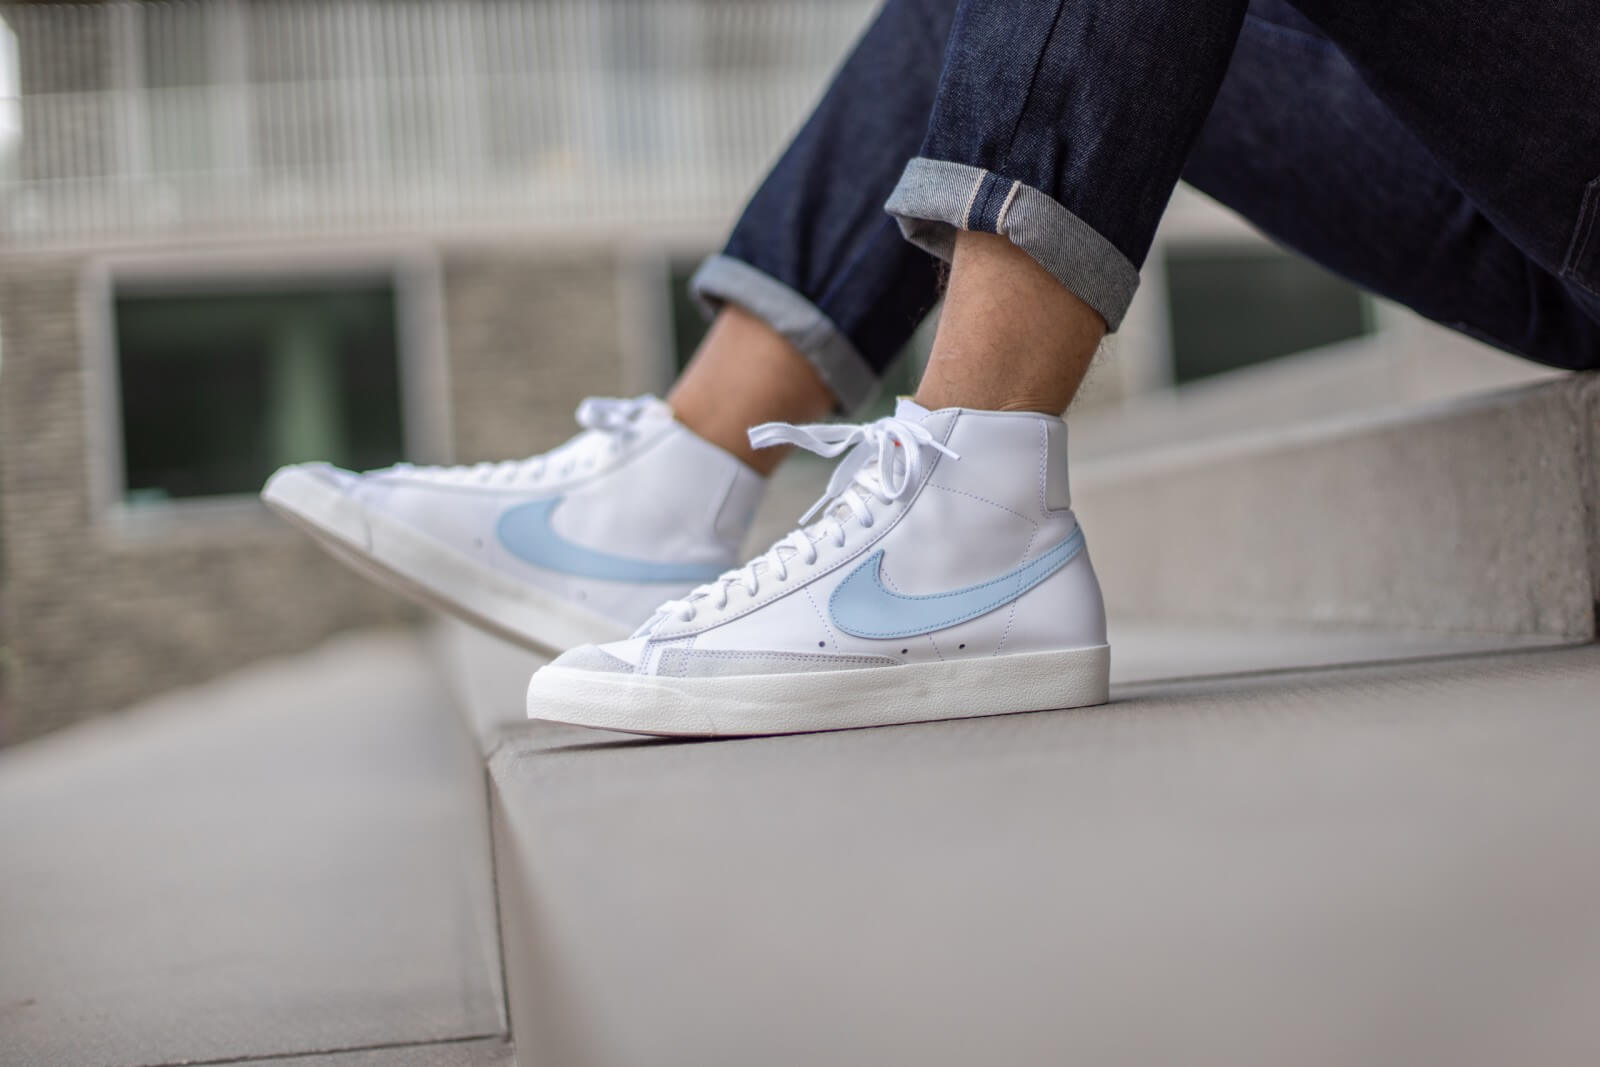 Nike Blazer Mid '77 Vintage White/Celastine Blue-Sail